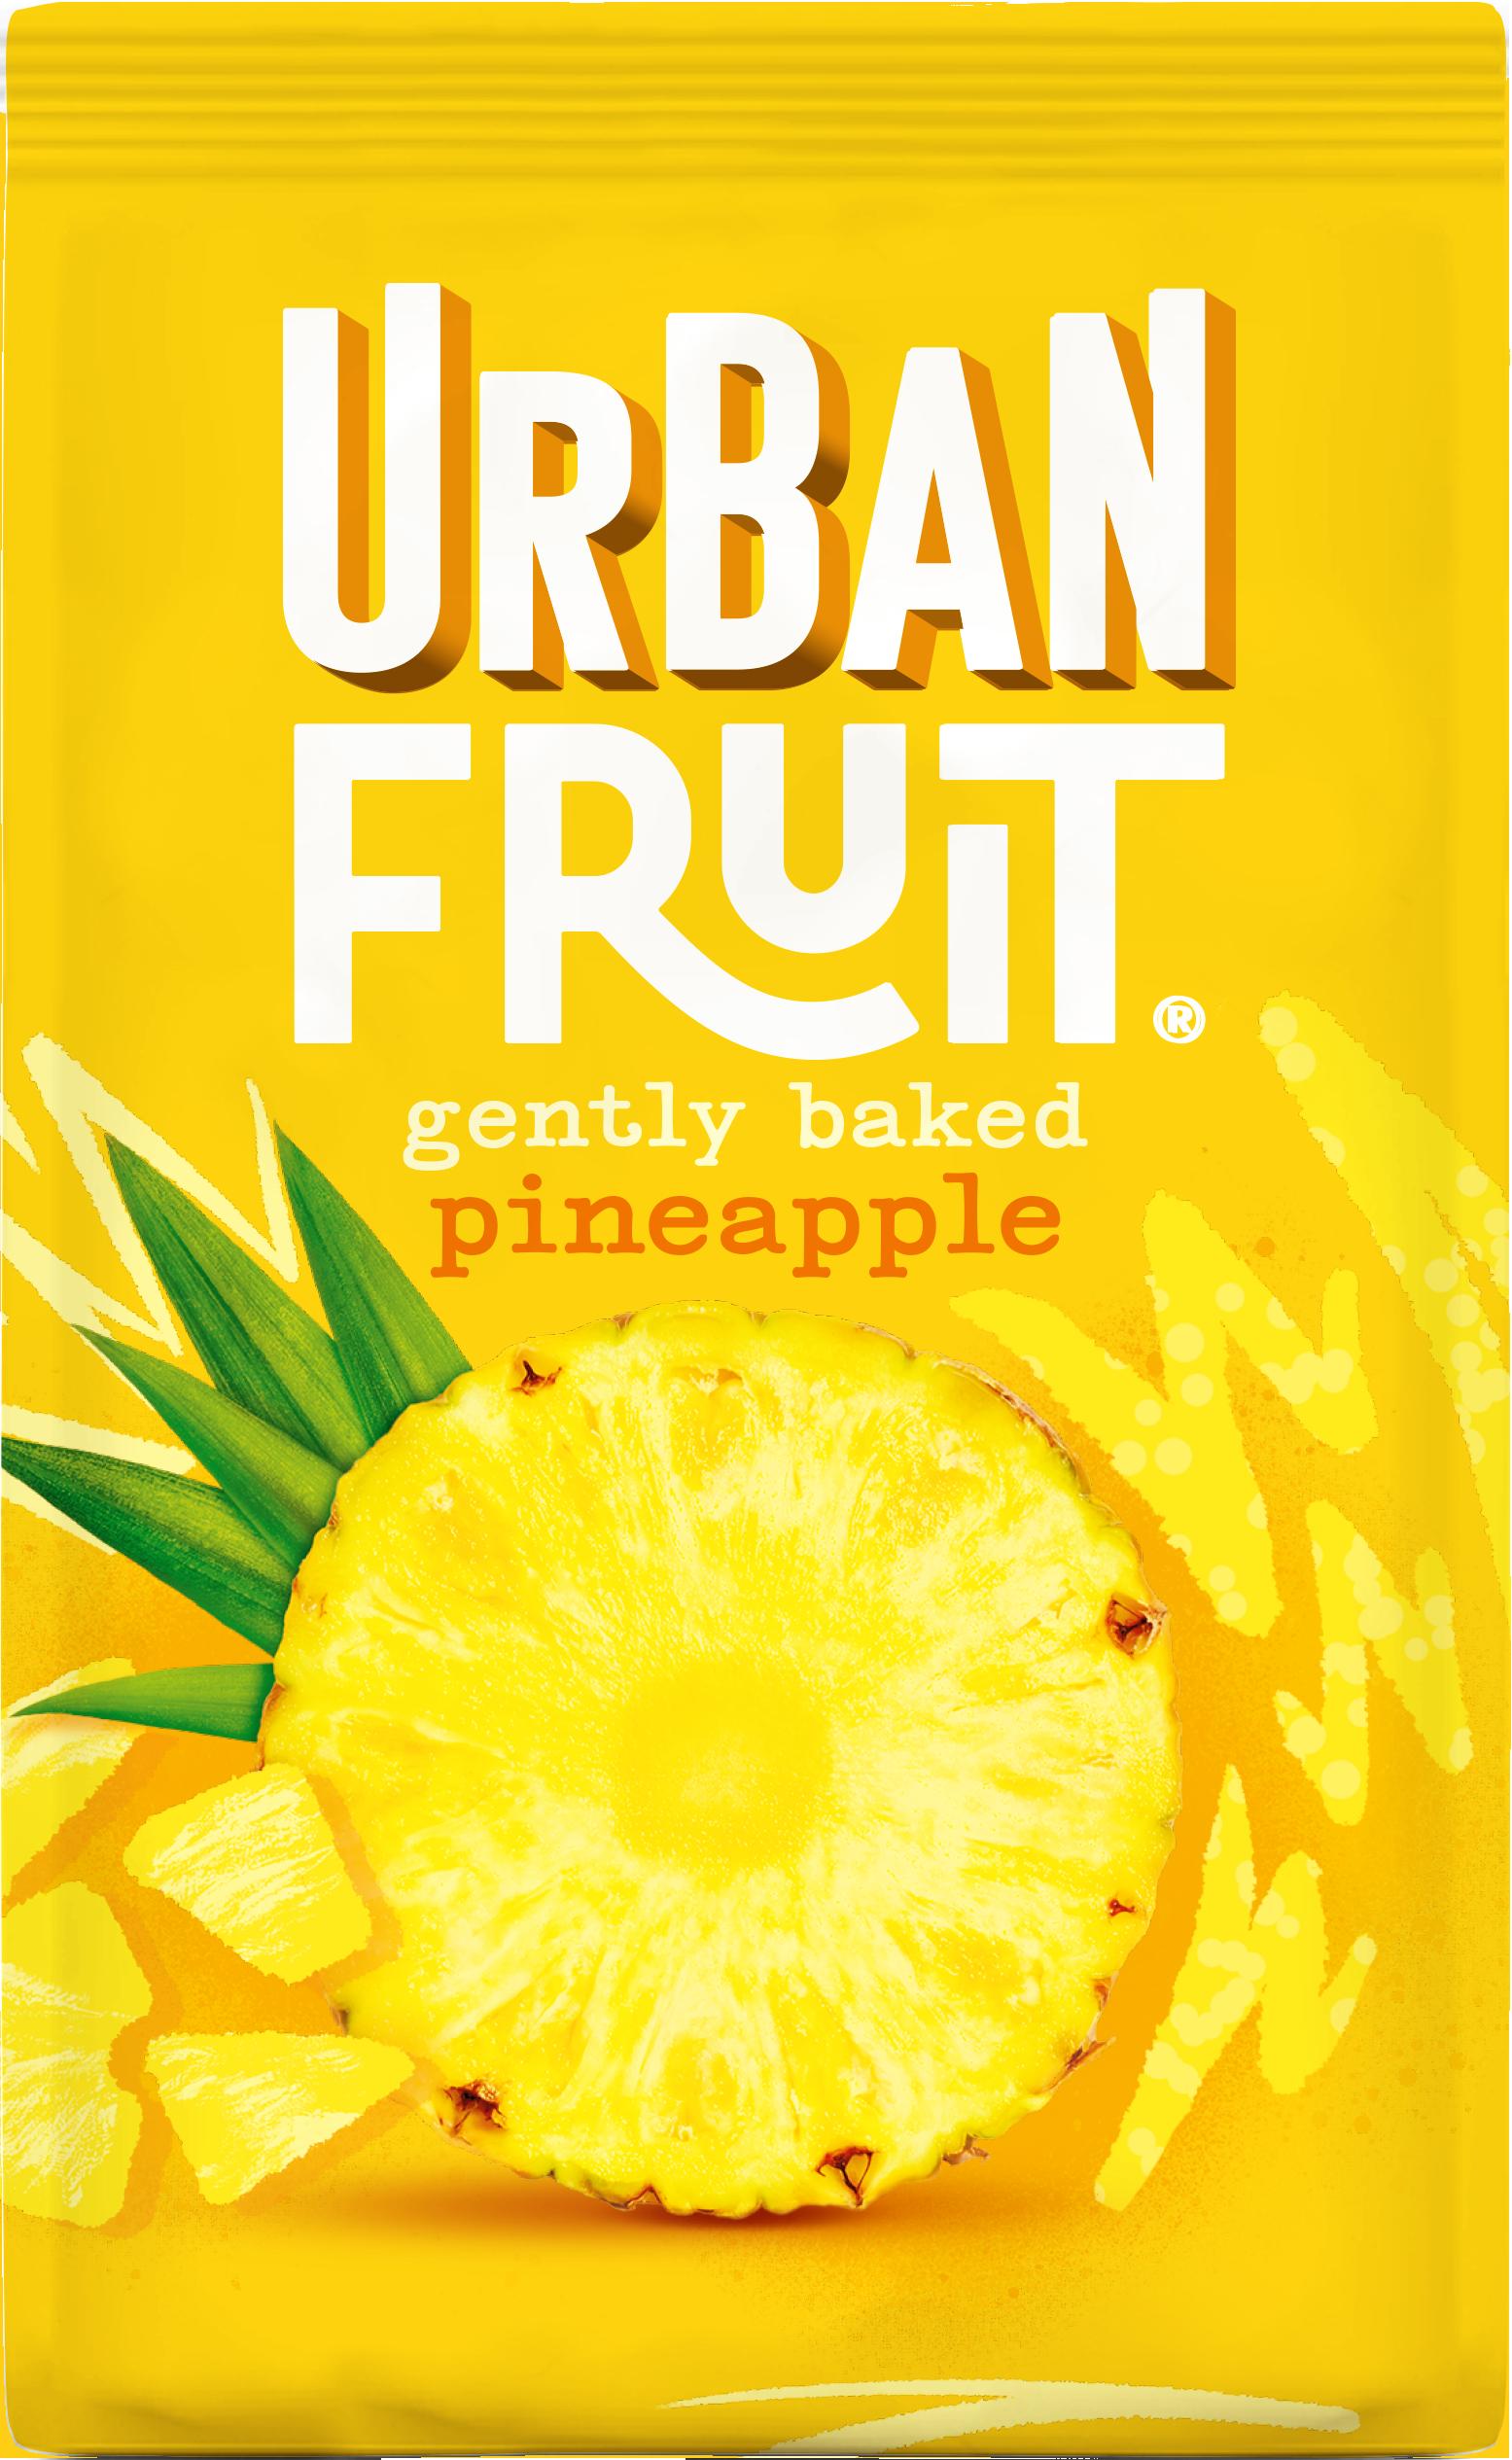 [Sharing] Pineapple